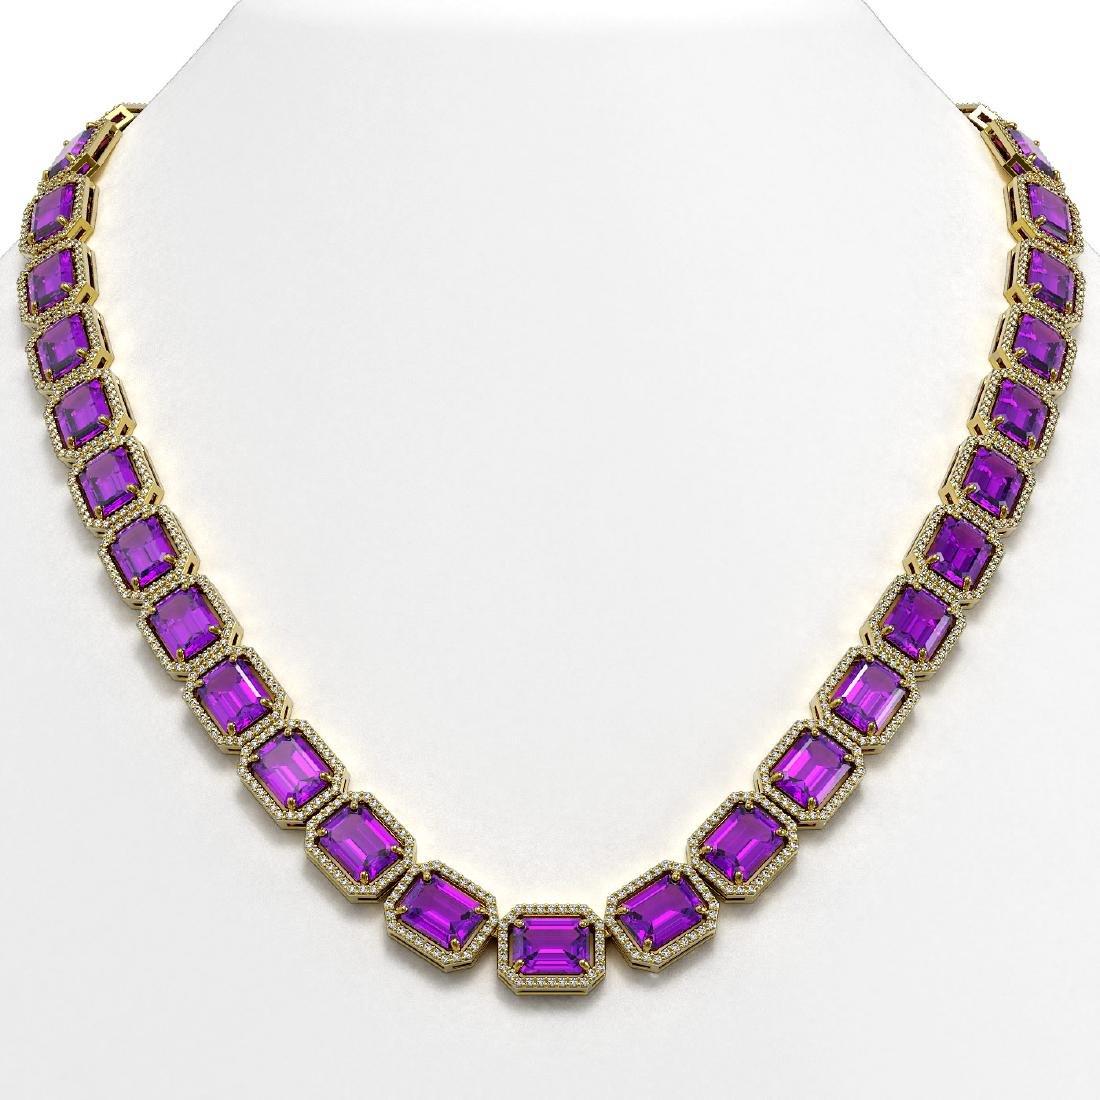 76.69 CTW Amethyst & Diamond Halo Necklace 10K Yellow